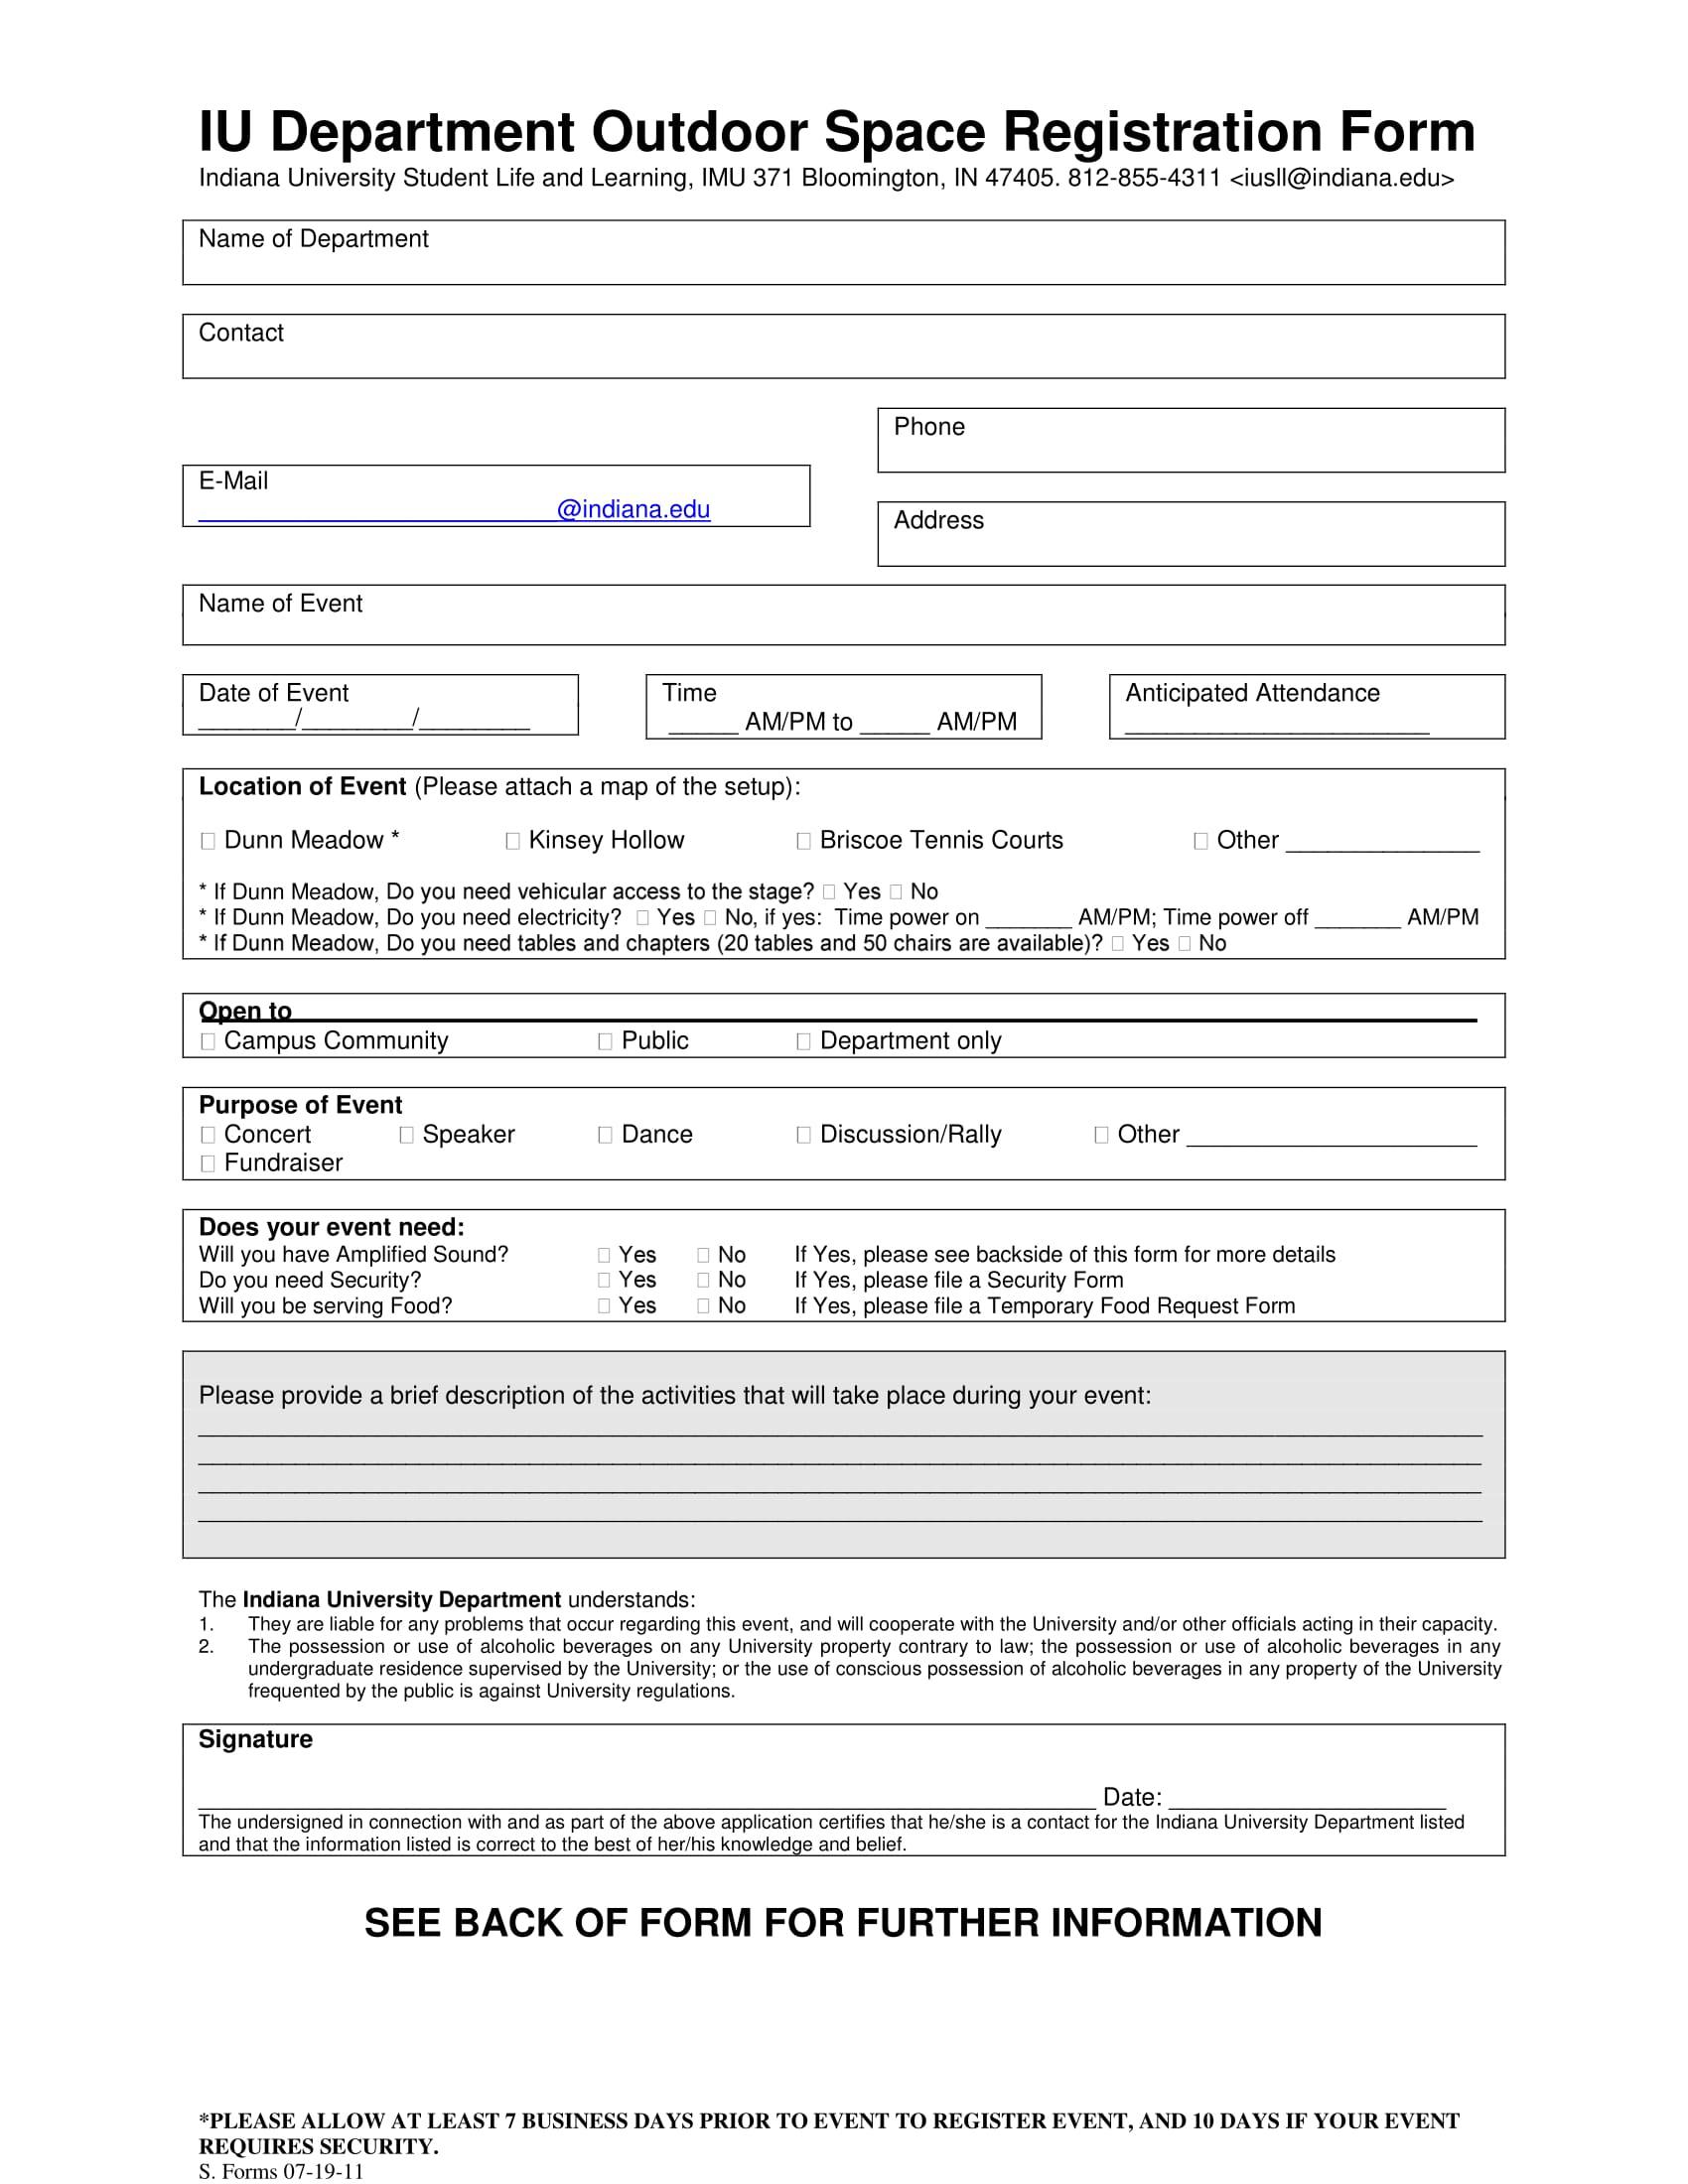 outdoor event registration form 1